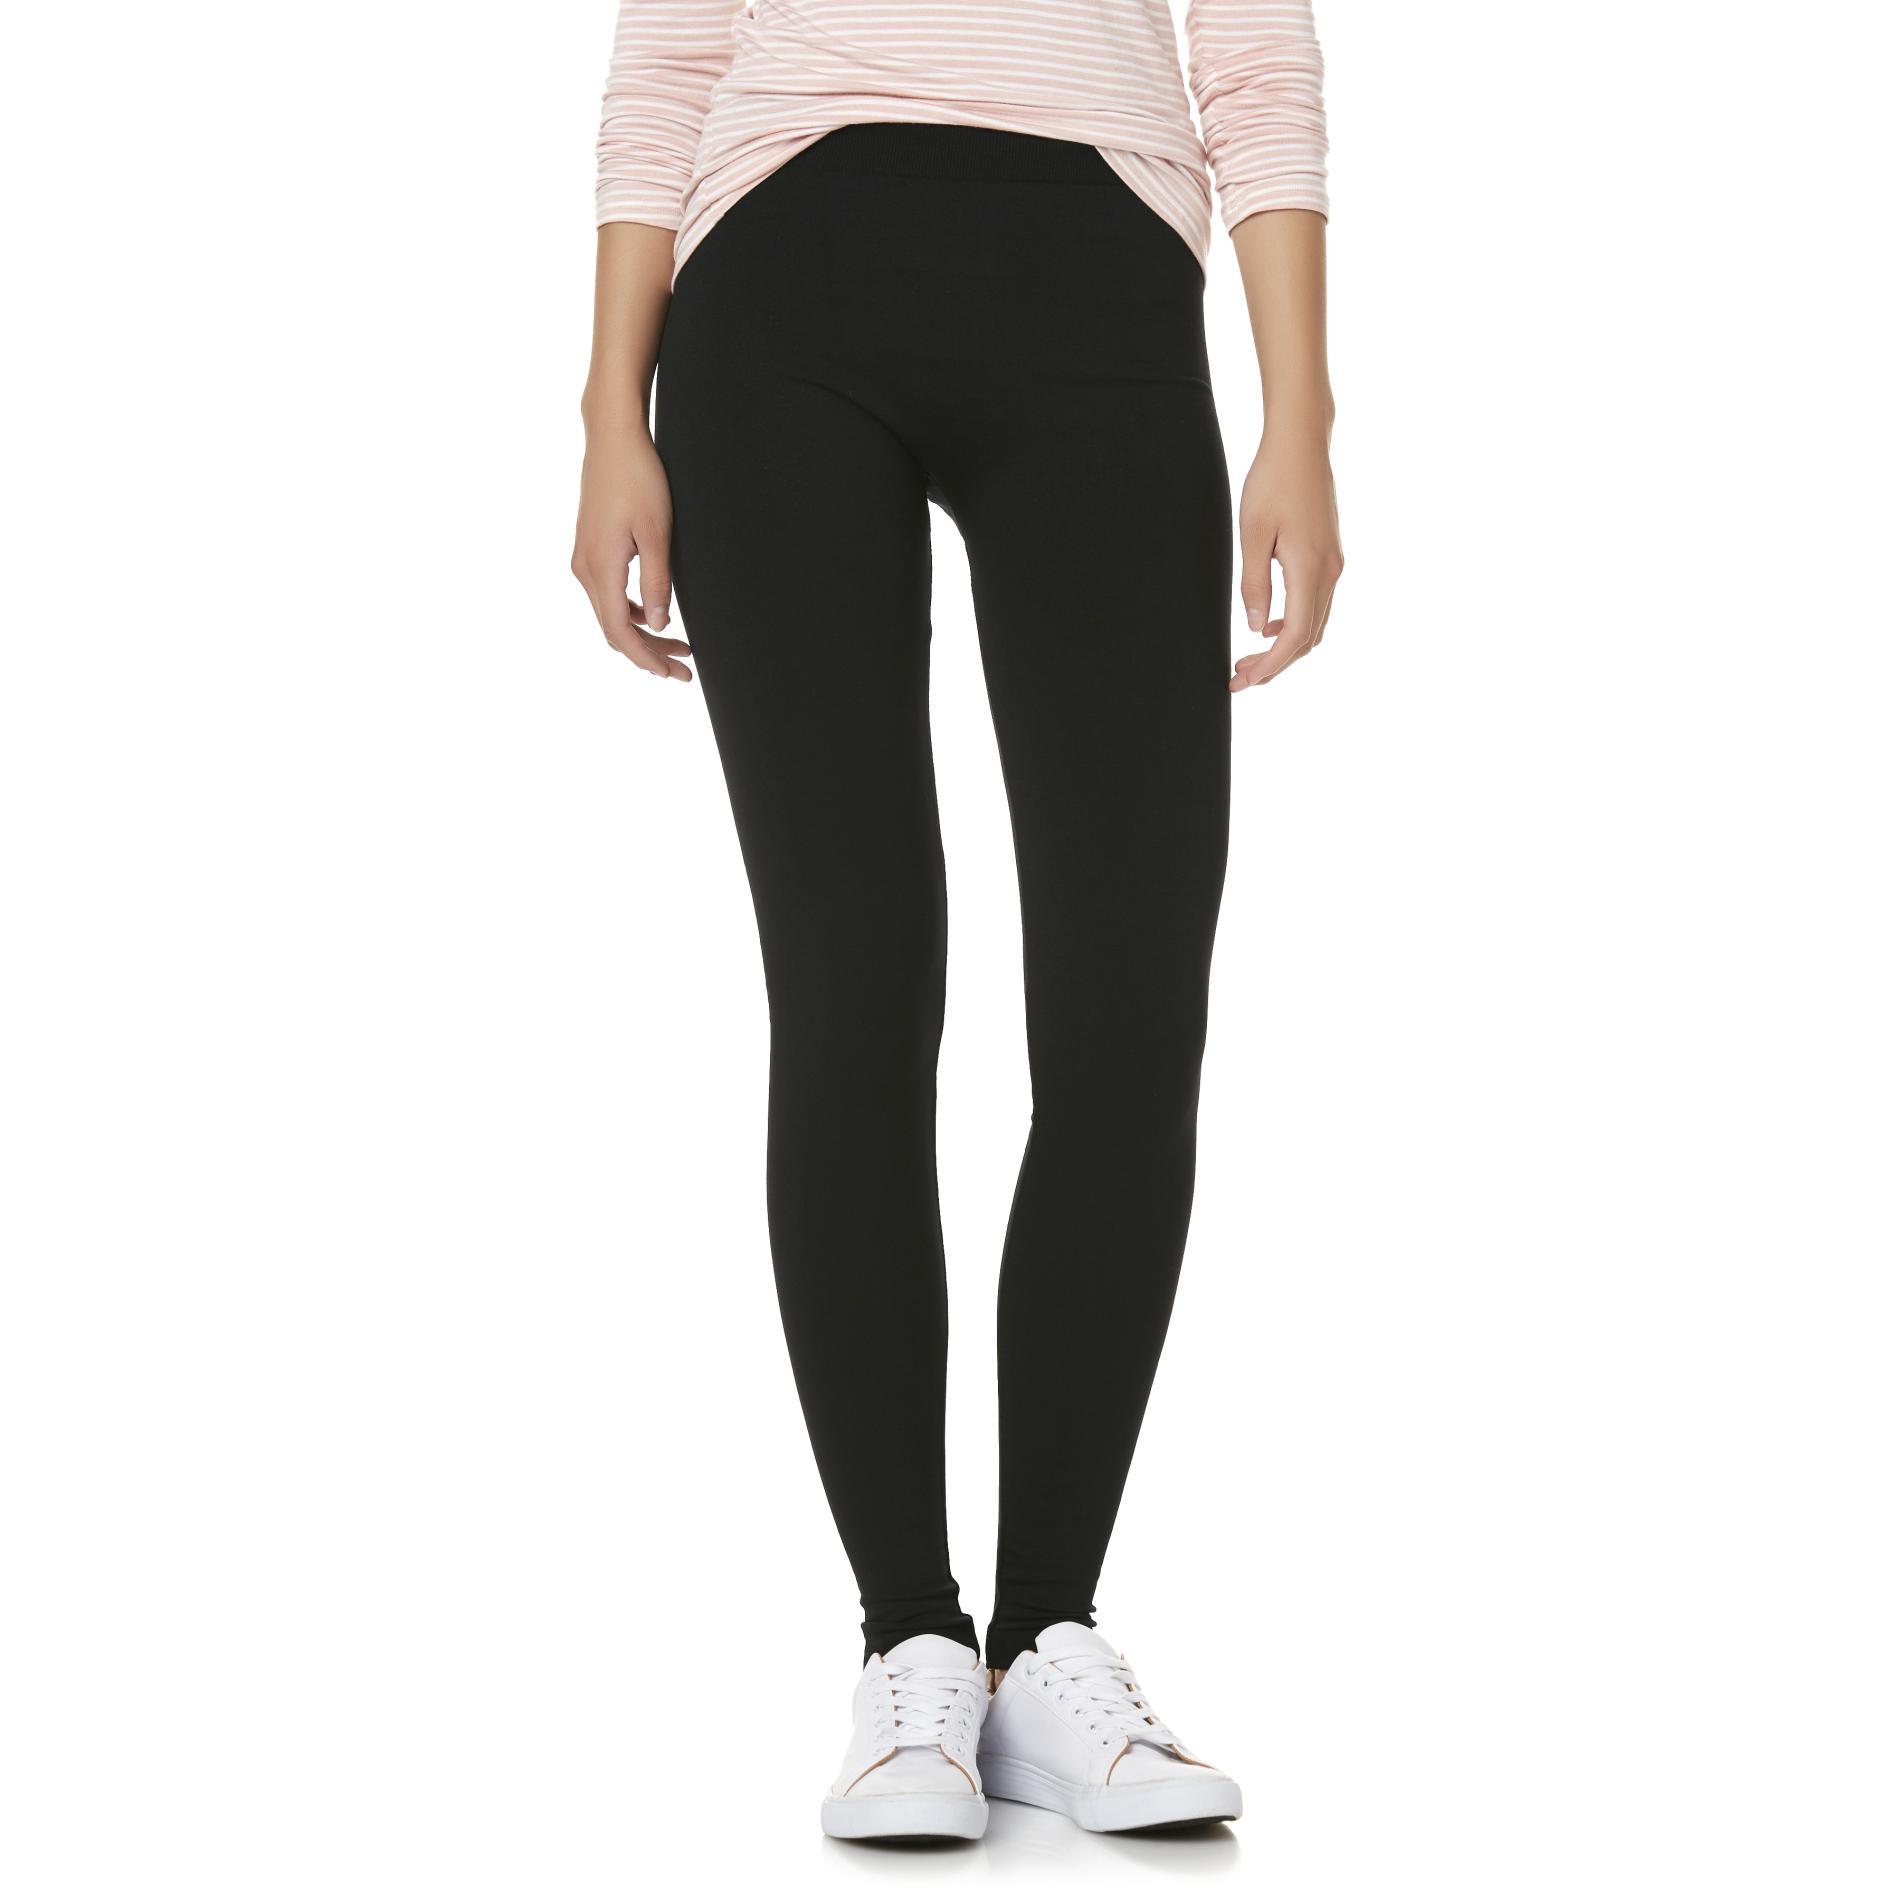 Bongo Juniors' Fleece-Lined Leggings PartNumber: 002VA99366112P MfgPartNumber: WH7BO58531JR